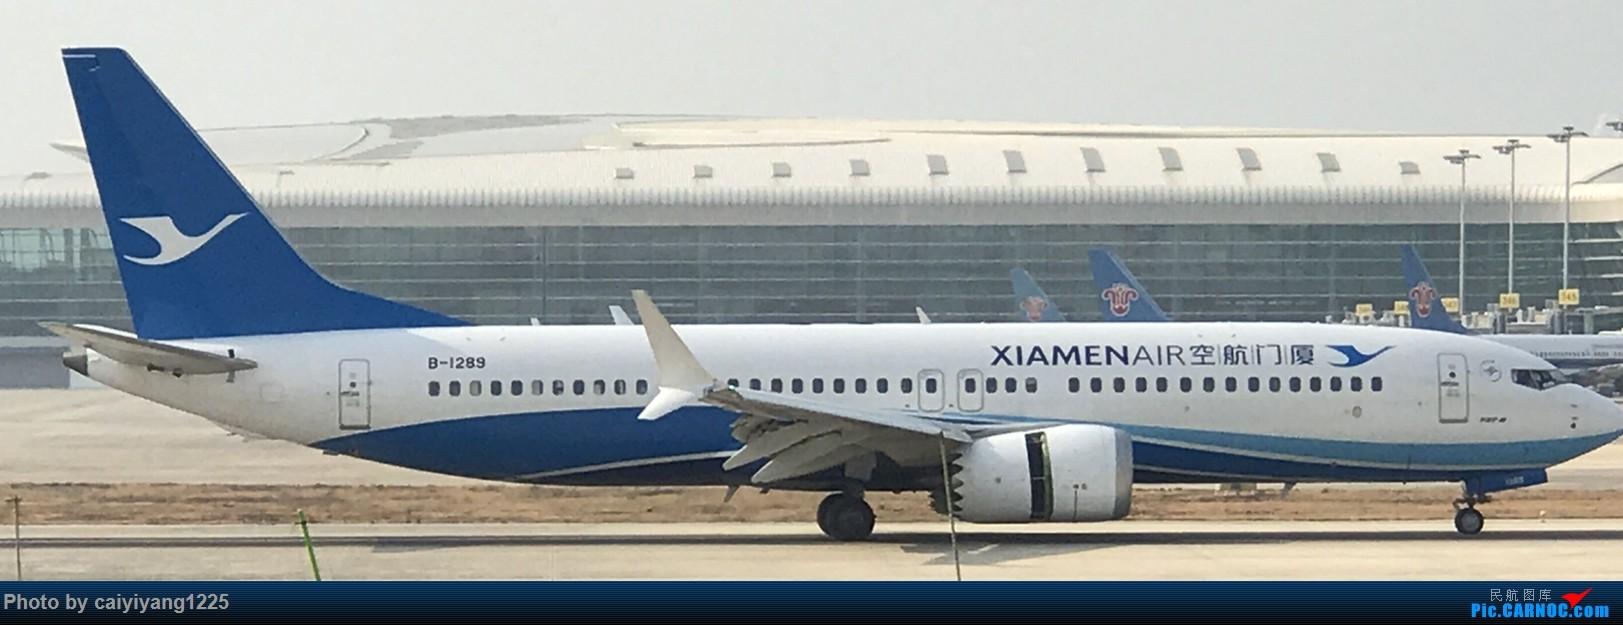 Re:[原创]武汉国庆拍机ps:出门忘带相机 拿手机拍的烂货请见谅! BOEING 737MAX-8 B-1289 武汉天河国际机场